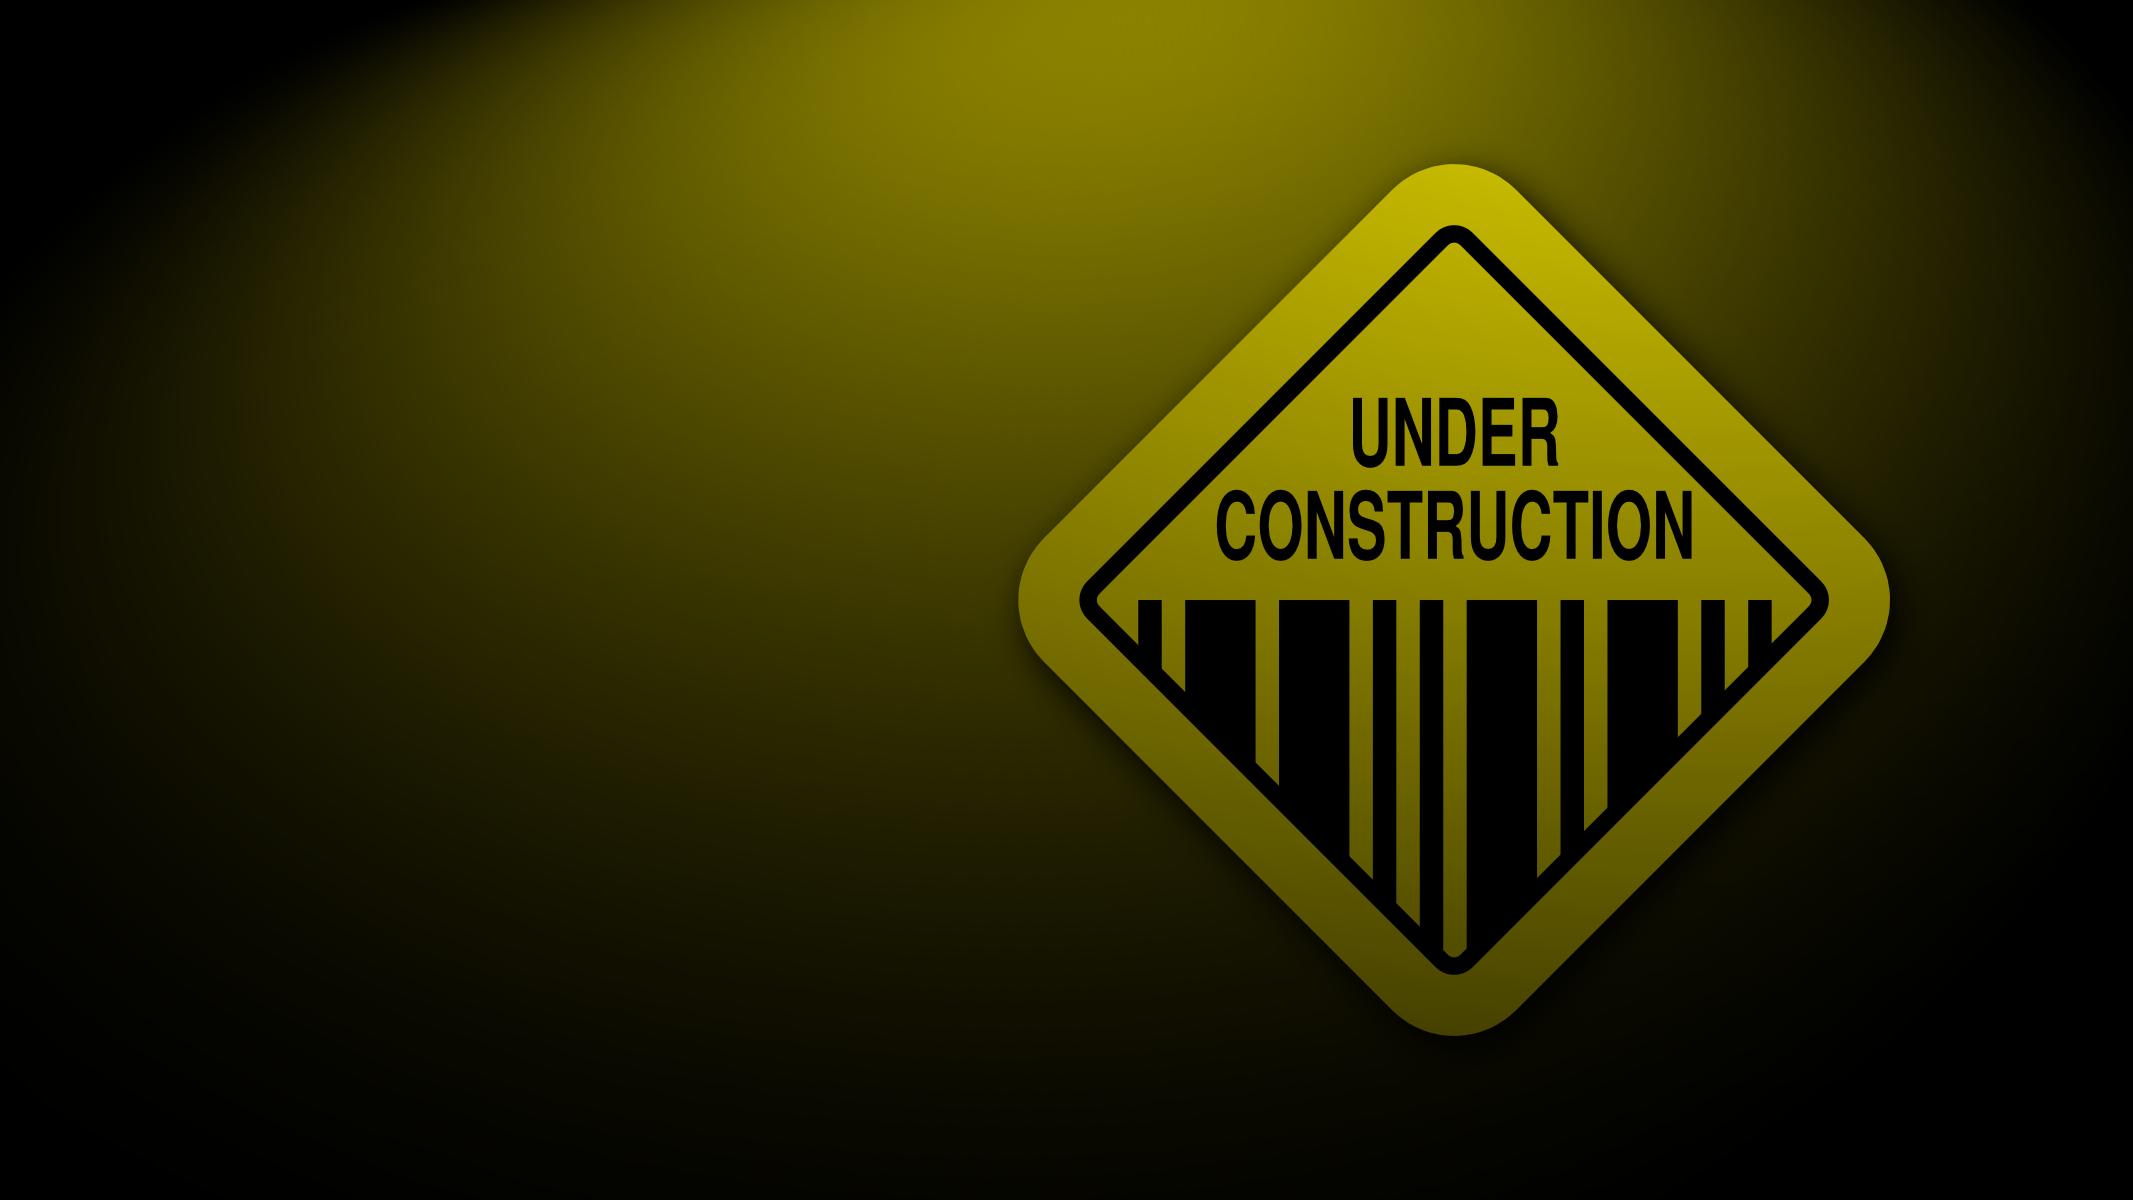 Filewikidata Logo Under Construction Sign Wallpaperpng